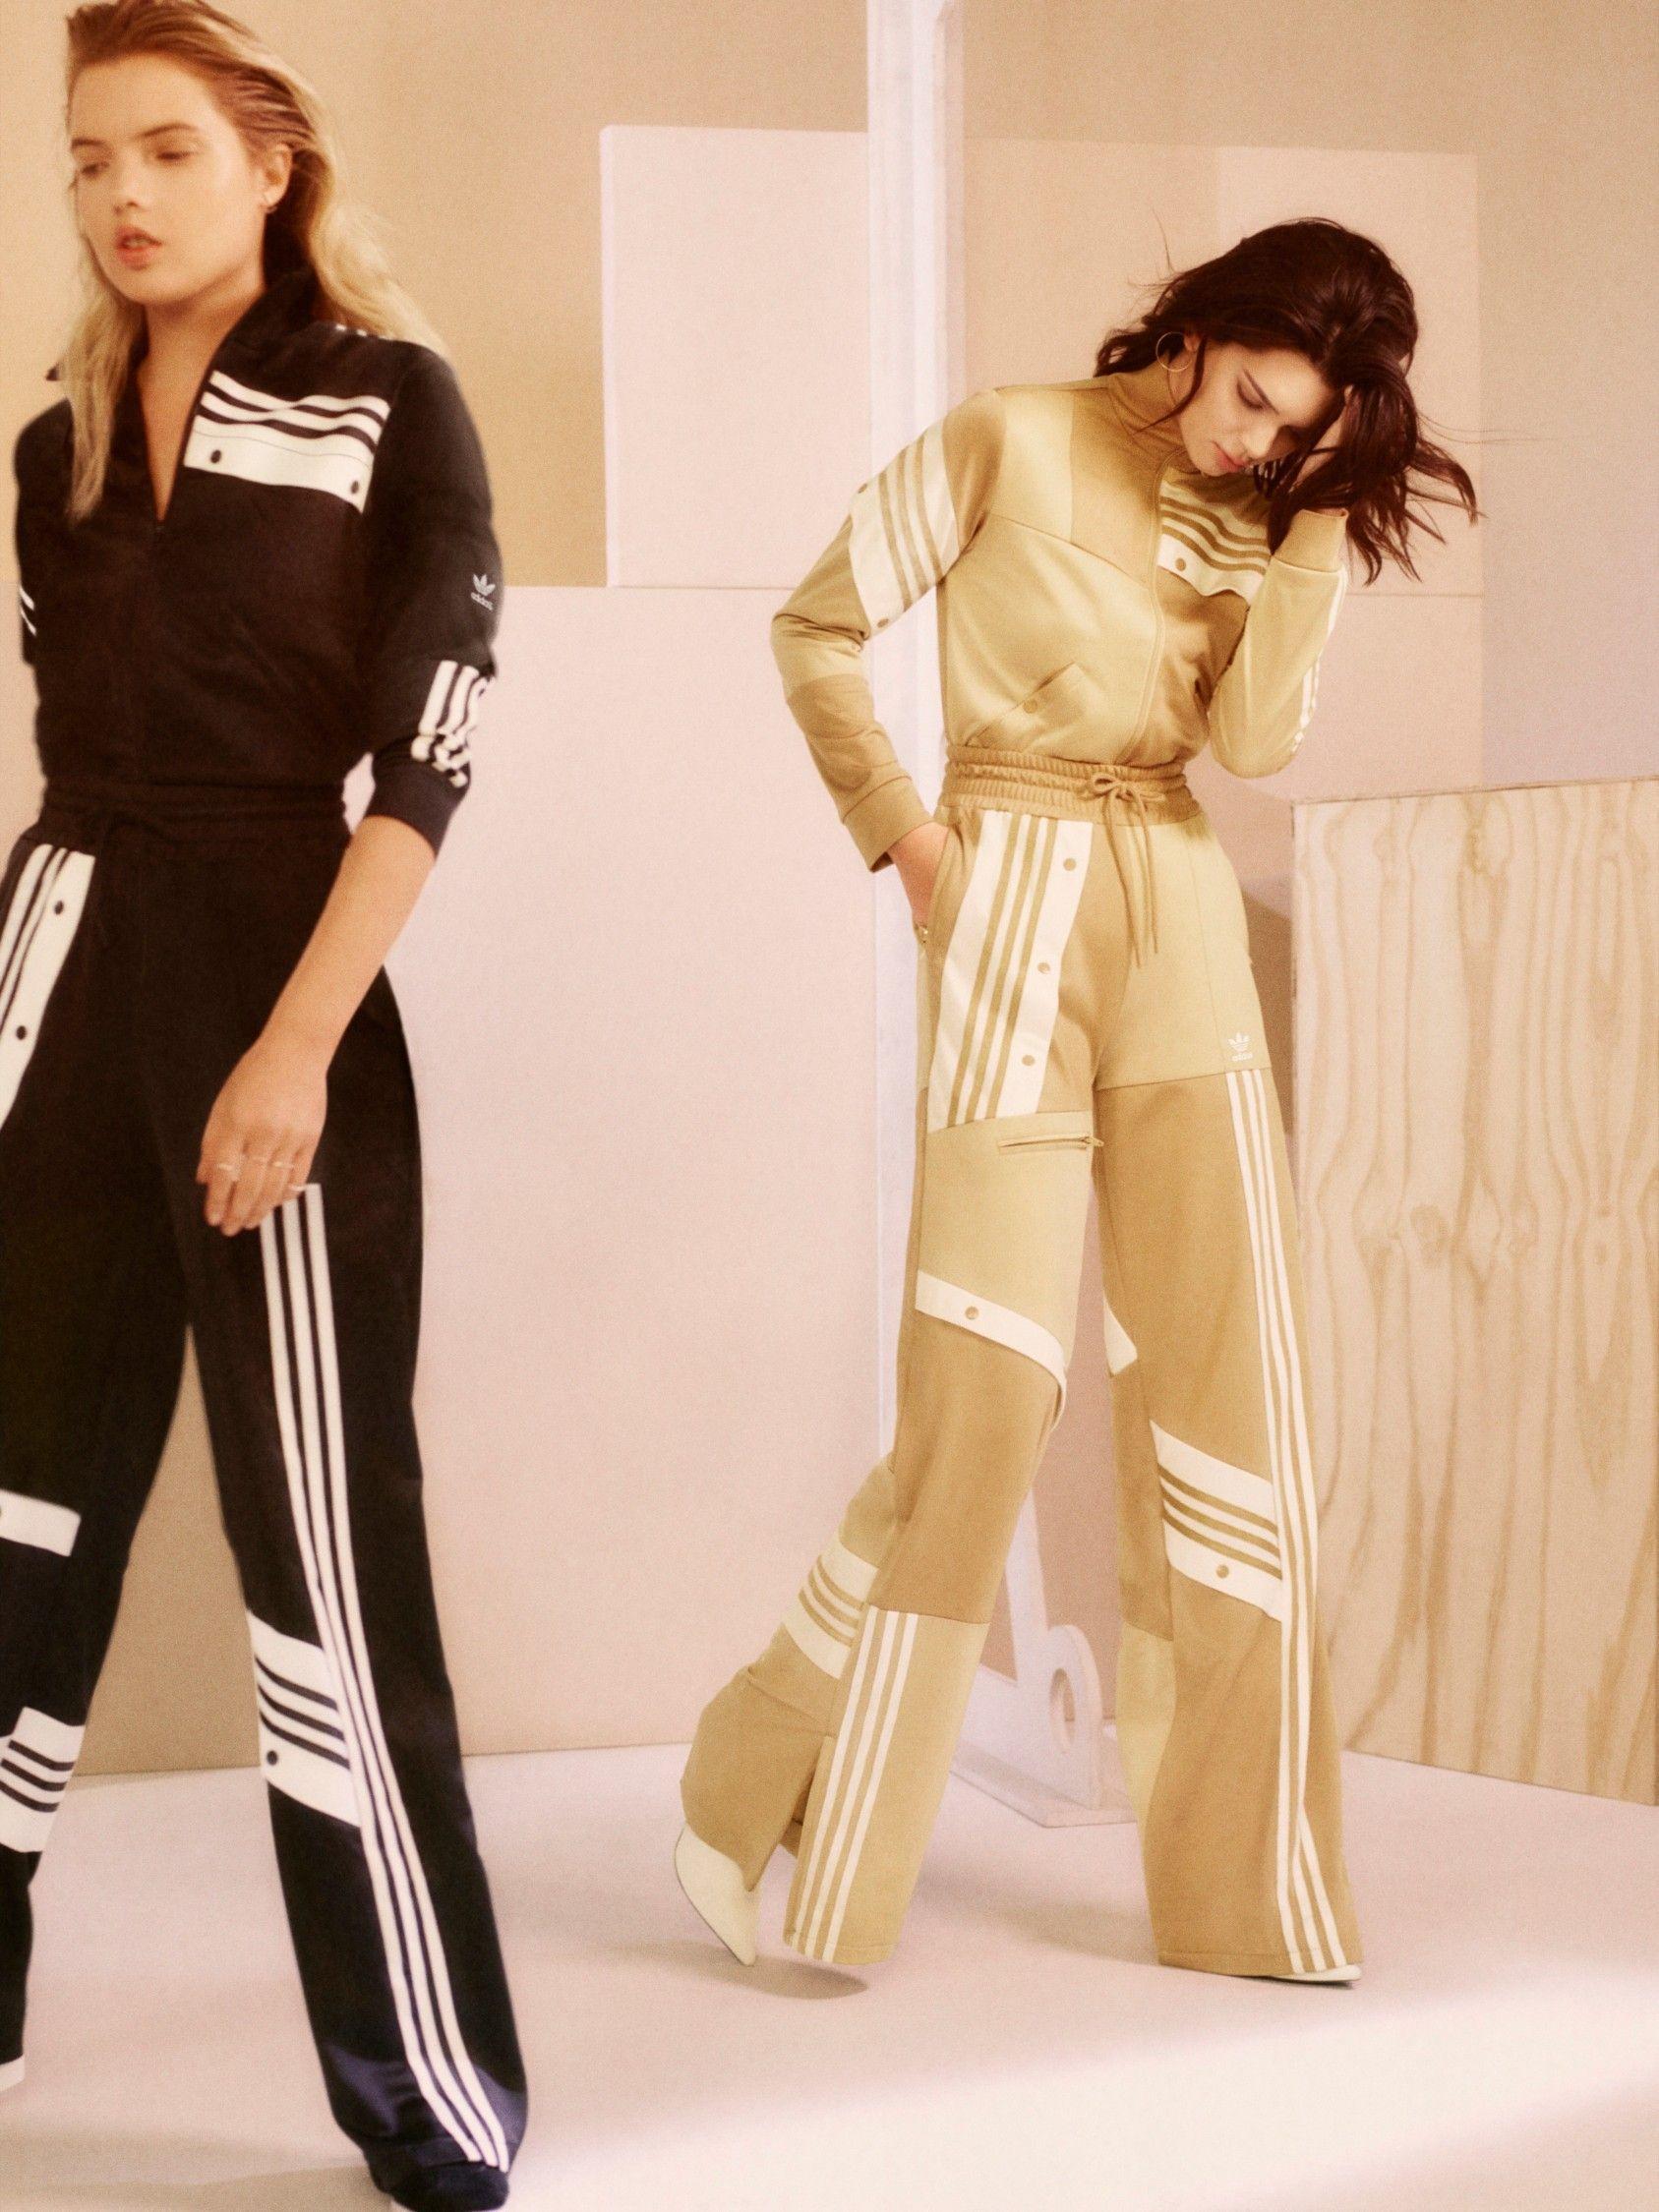 90a89c9d458a0 Adidas Originals x Danielle Cathari Collaboration Debut   NYFW – PAUSE  Online